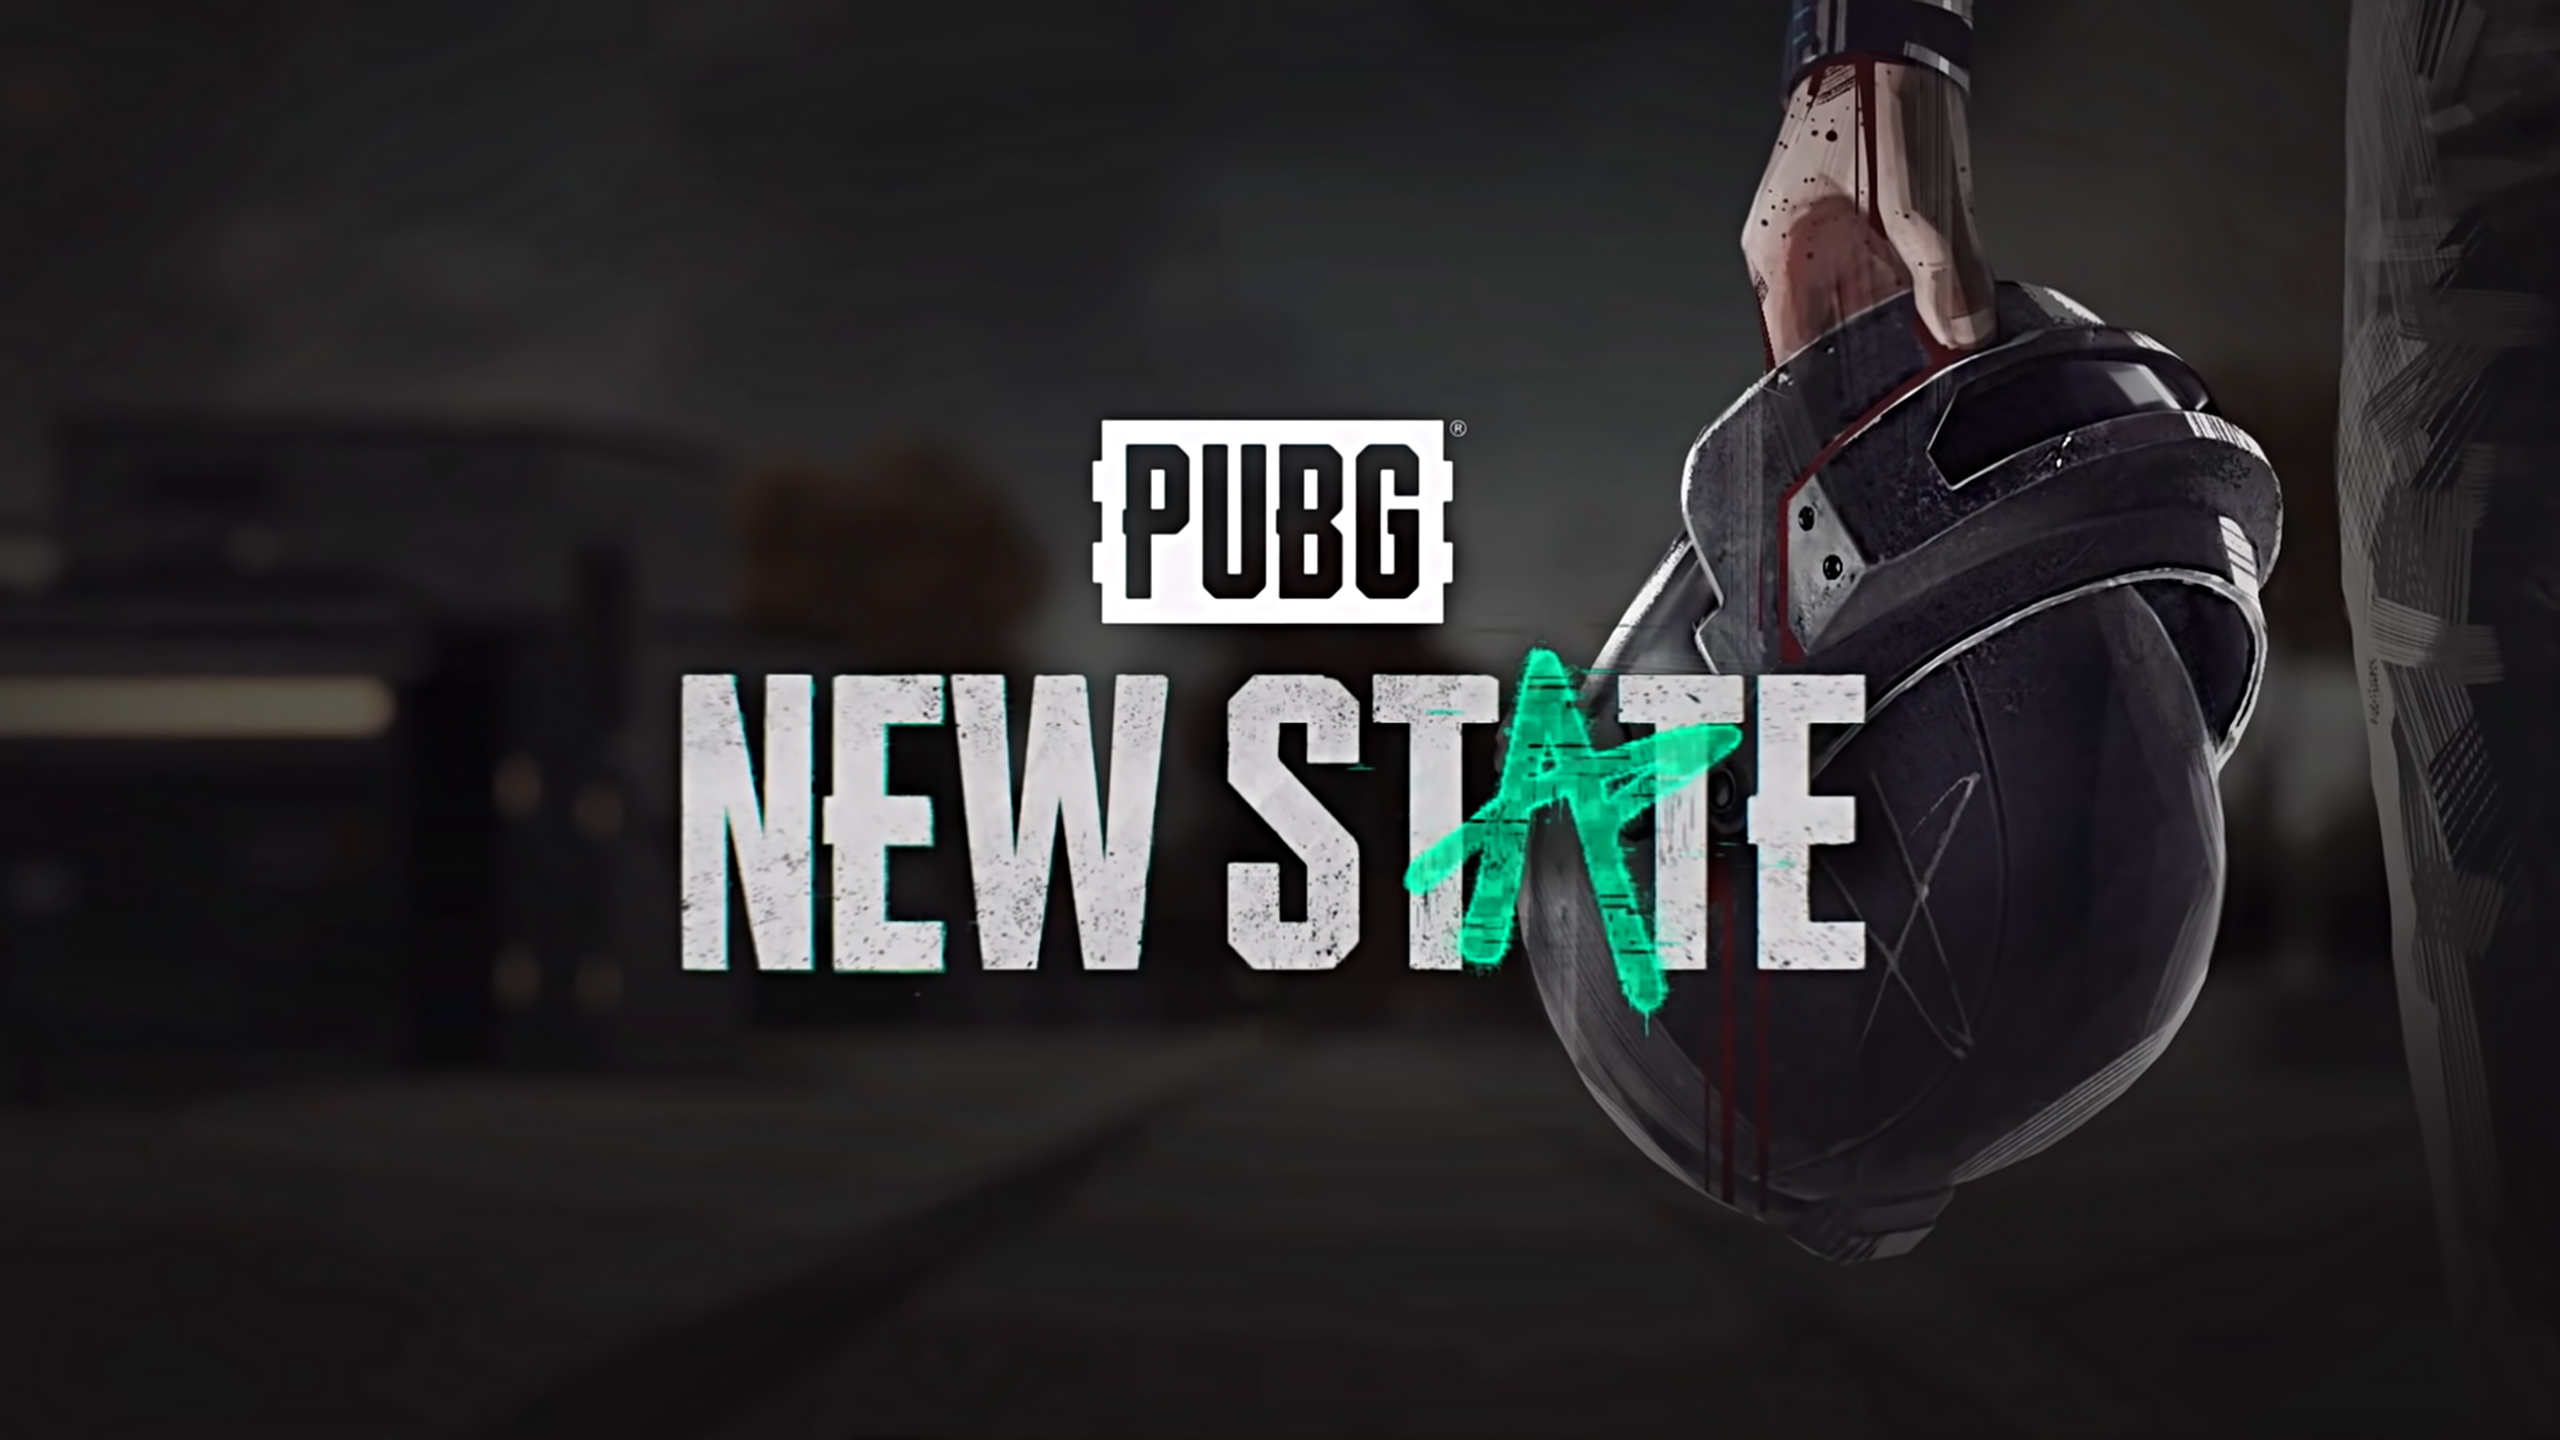 Wallpaper PUBG: New State